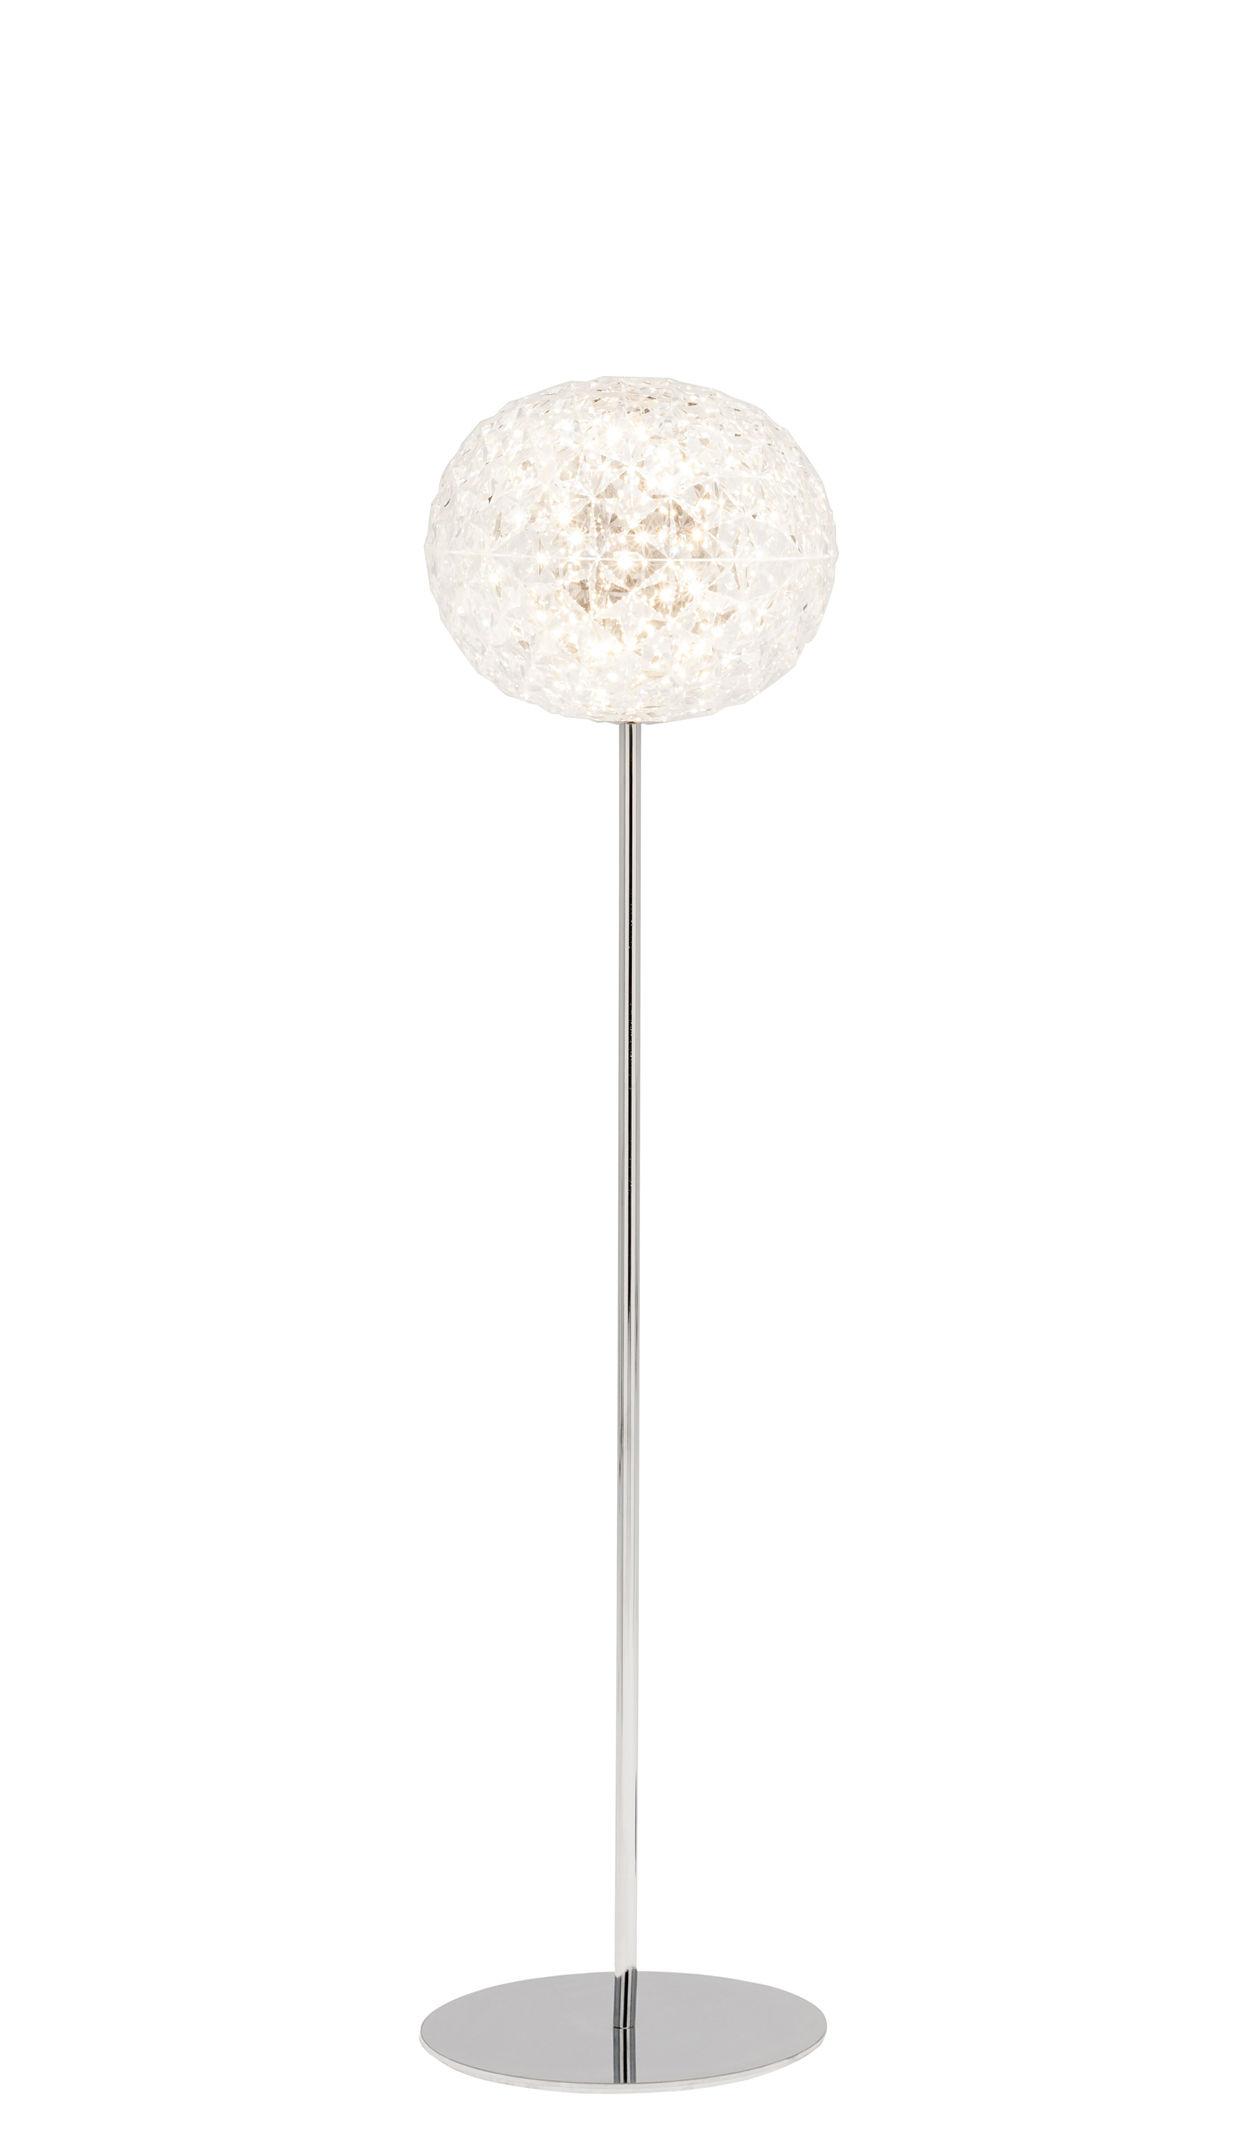 Lighting - Floor lamps - Planet Floor lamp - / LED - H 130 cm by Kartell - Crystal / Silver base - Aluminium, Thermoplastic technopolymer